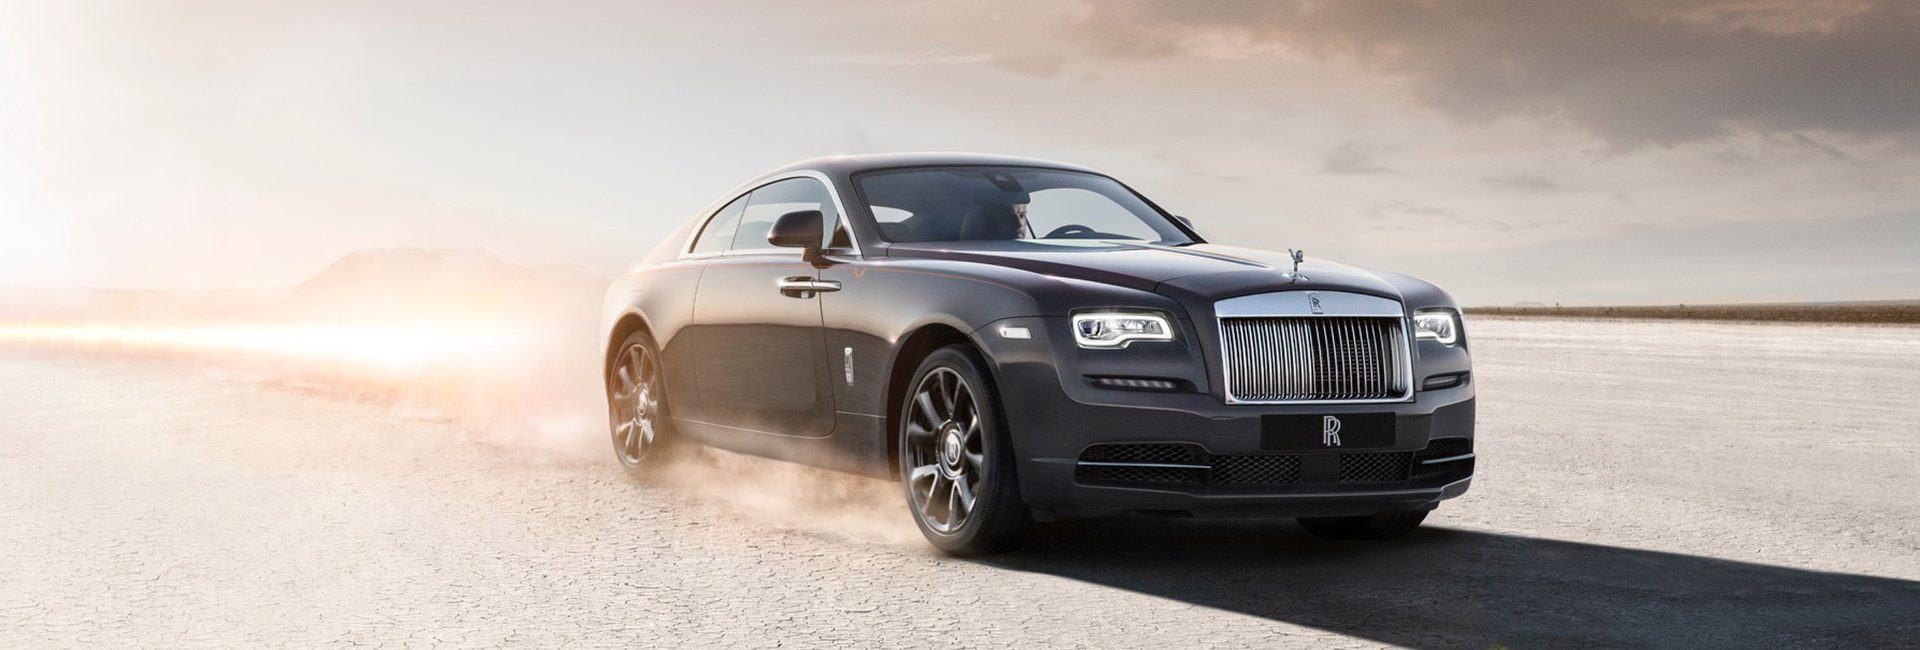 New Rolls Royce New Wraith Birmingham Blythe Valley Park And Bristol Rybrook